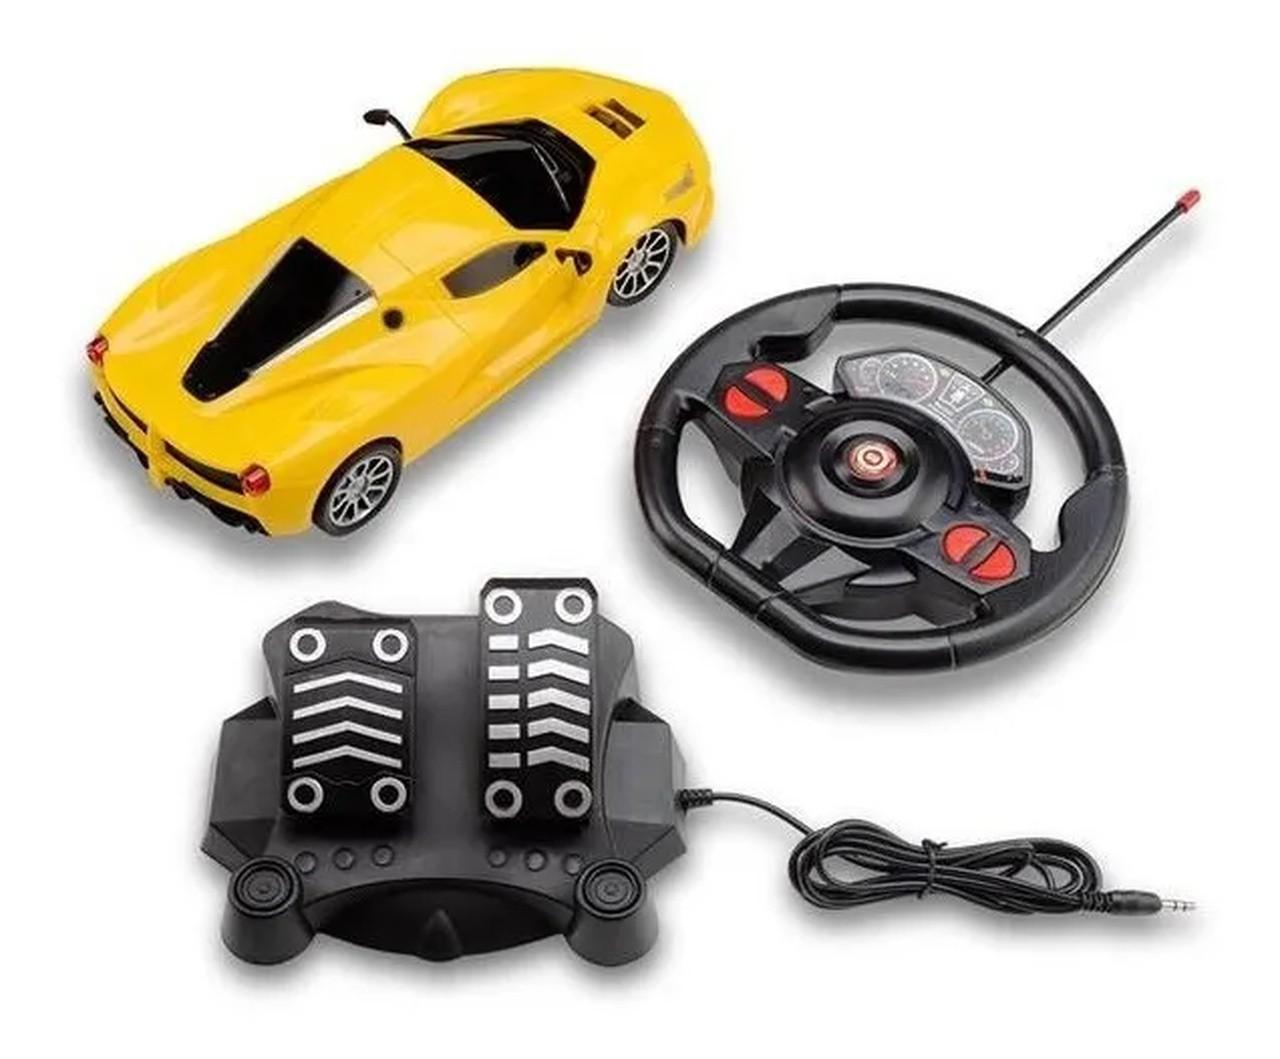 Carrinho de Controle Racing Control Multikids 1/16 - Amarelo